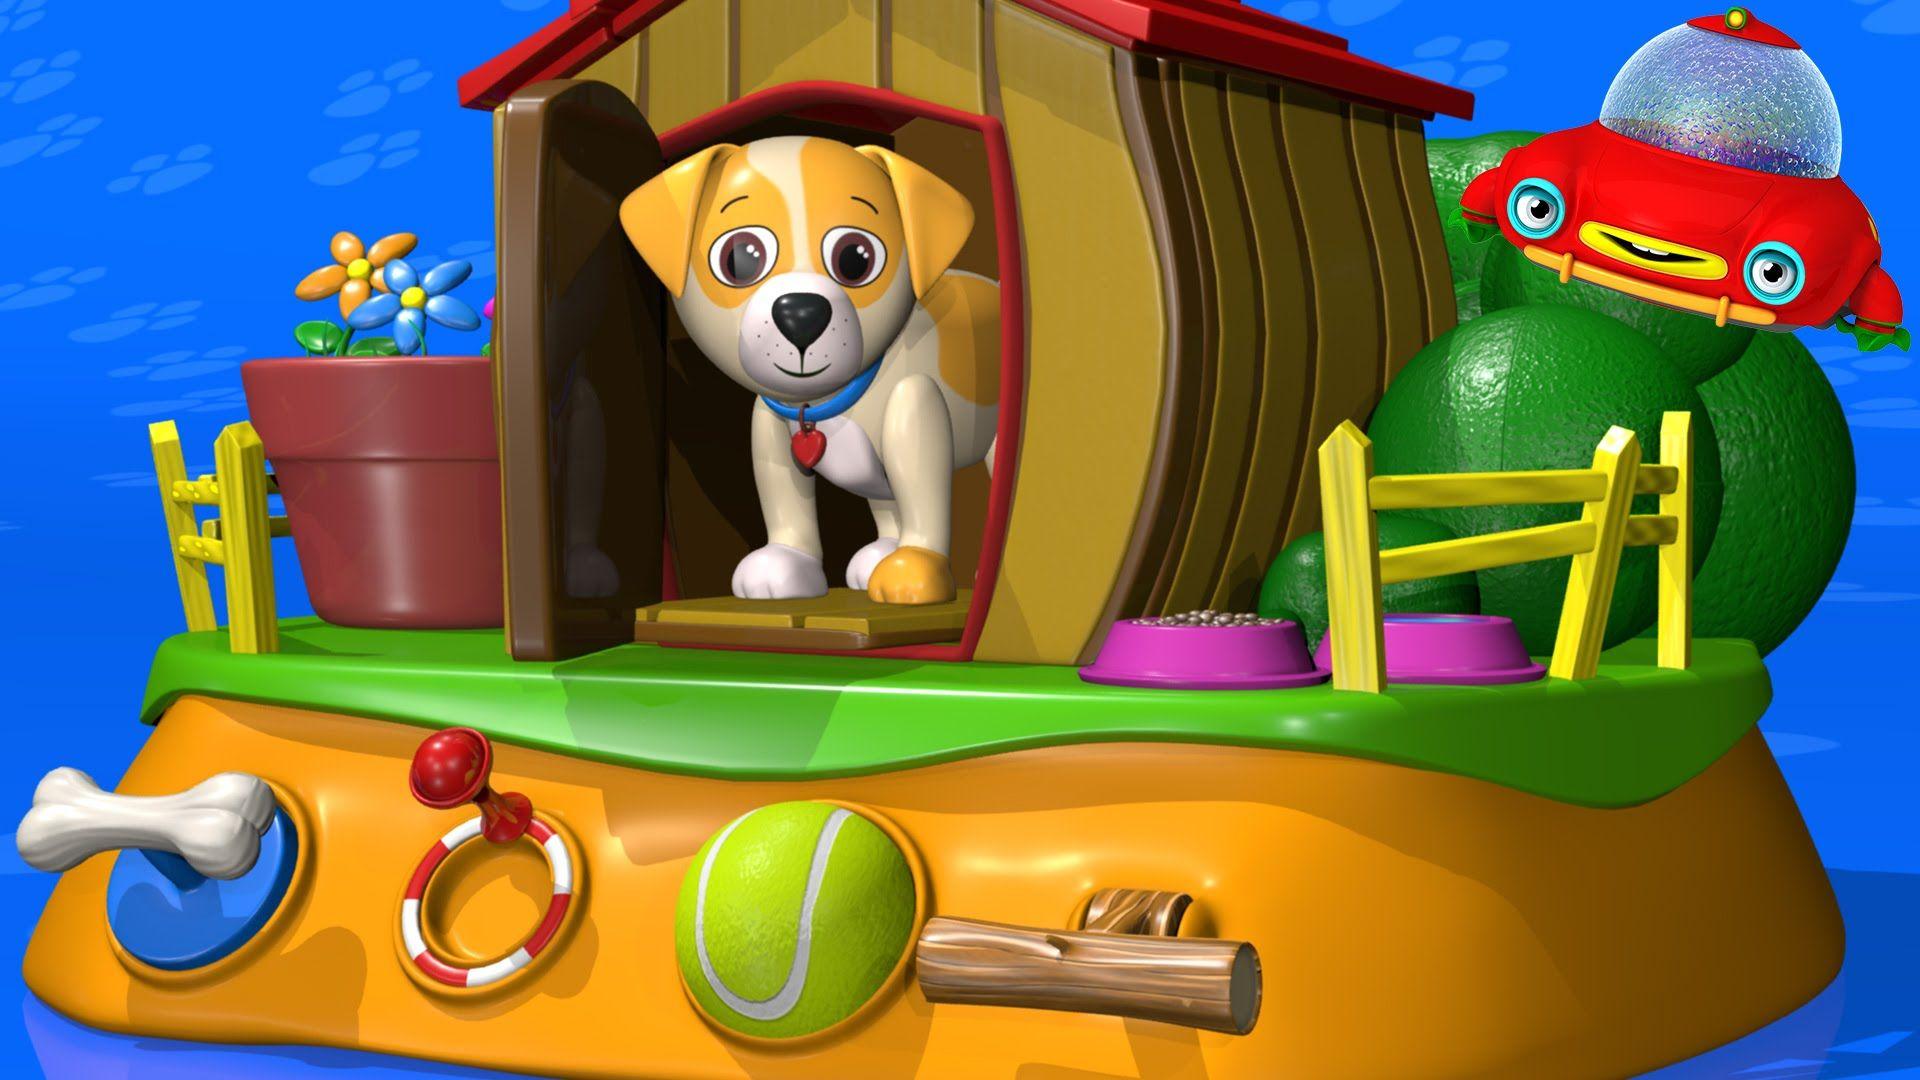 TuTiTu Animals Animal Toys for Children Dog